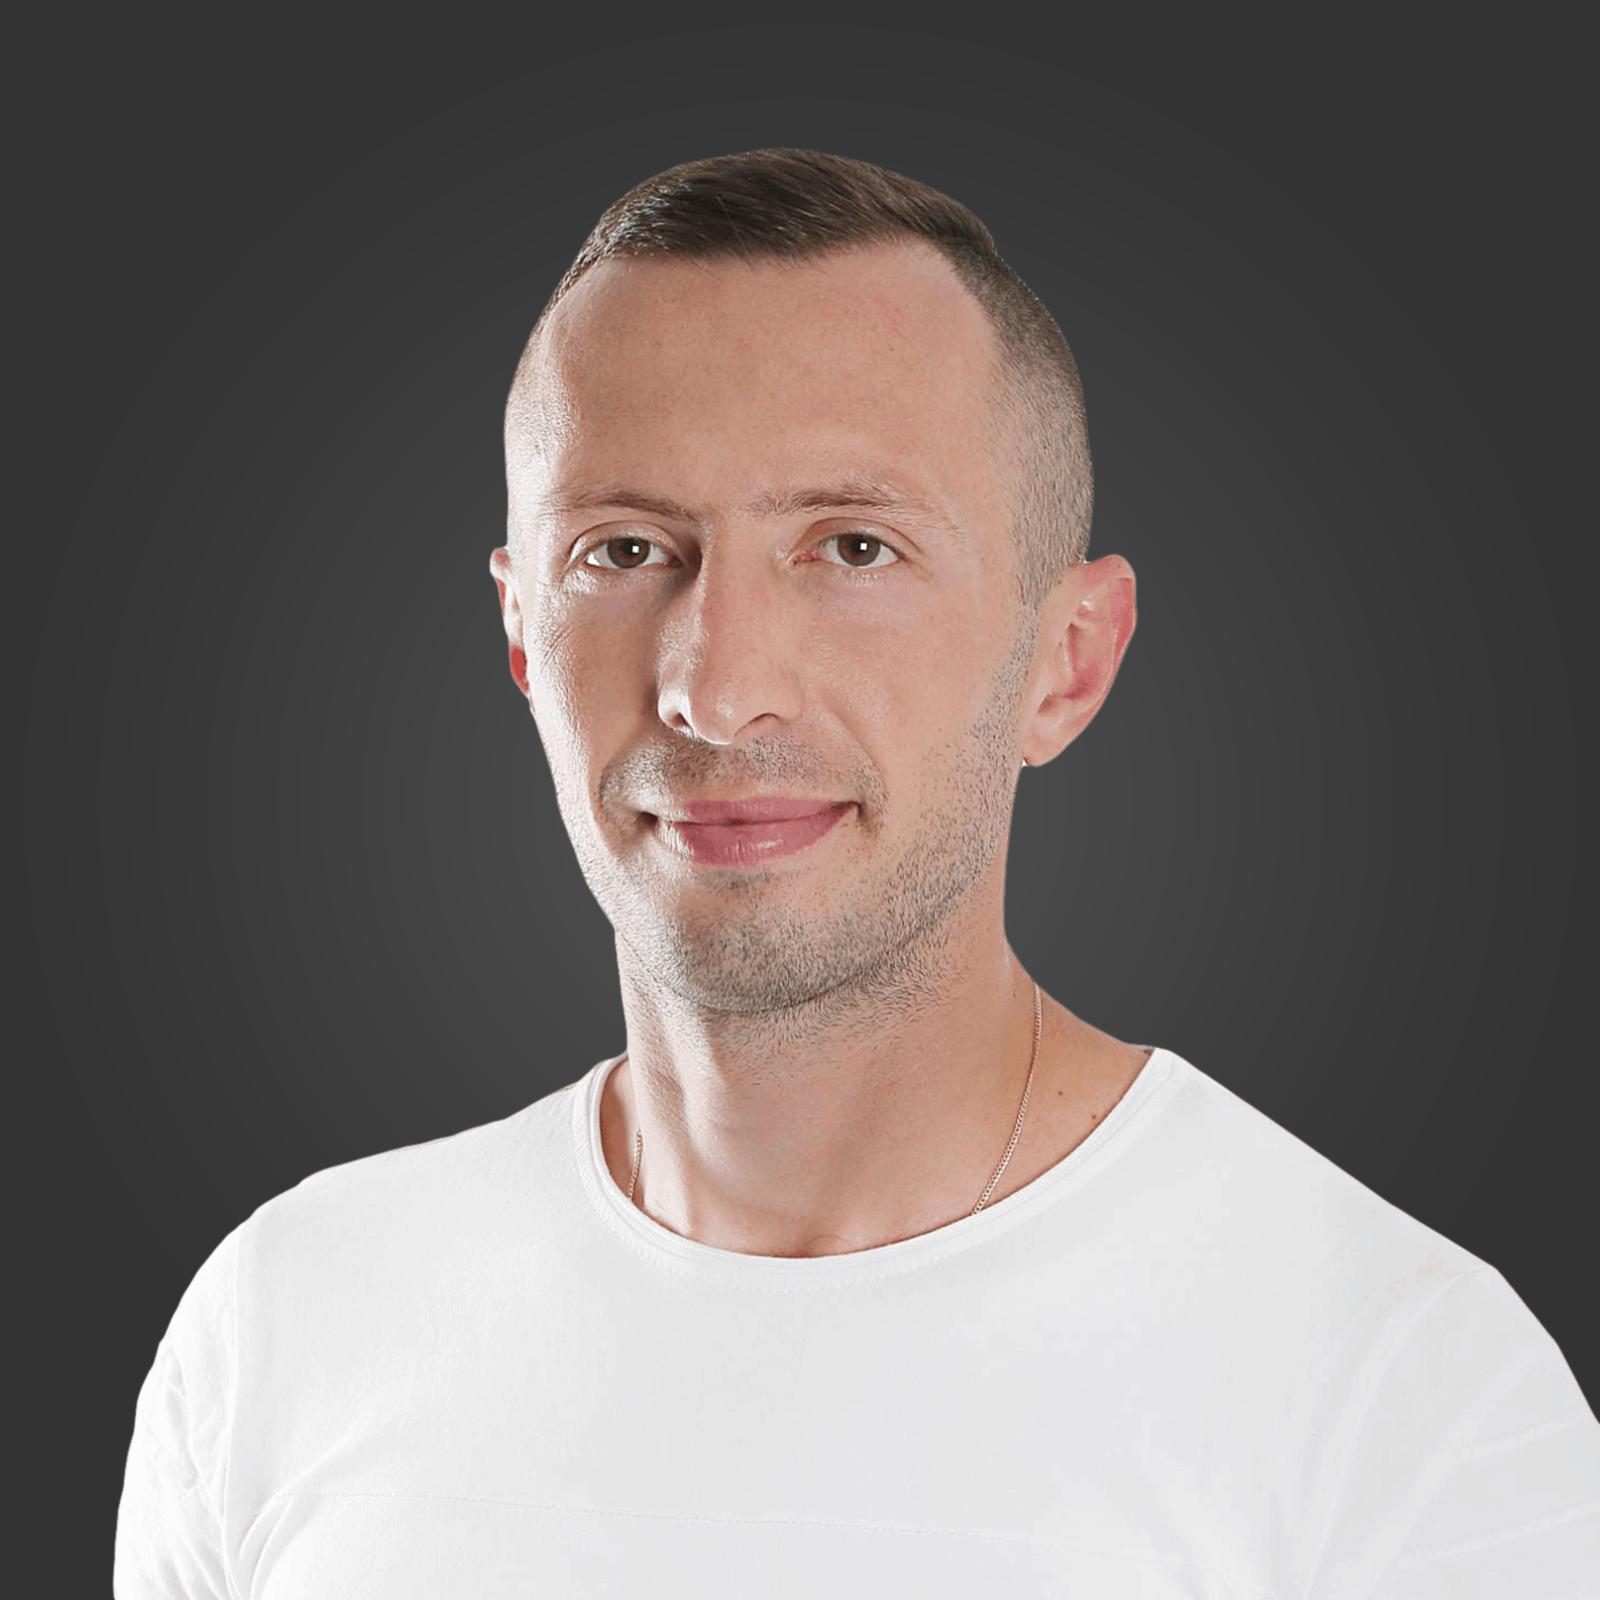 רוני קפלן